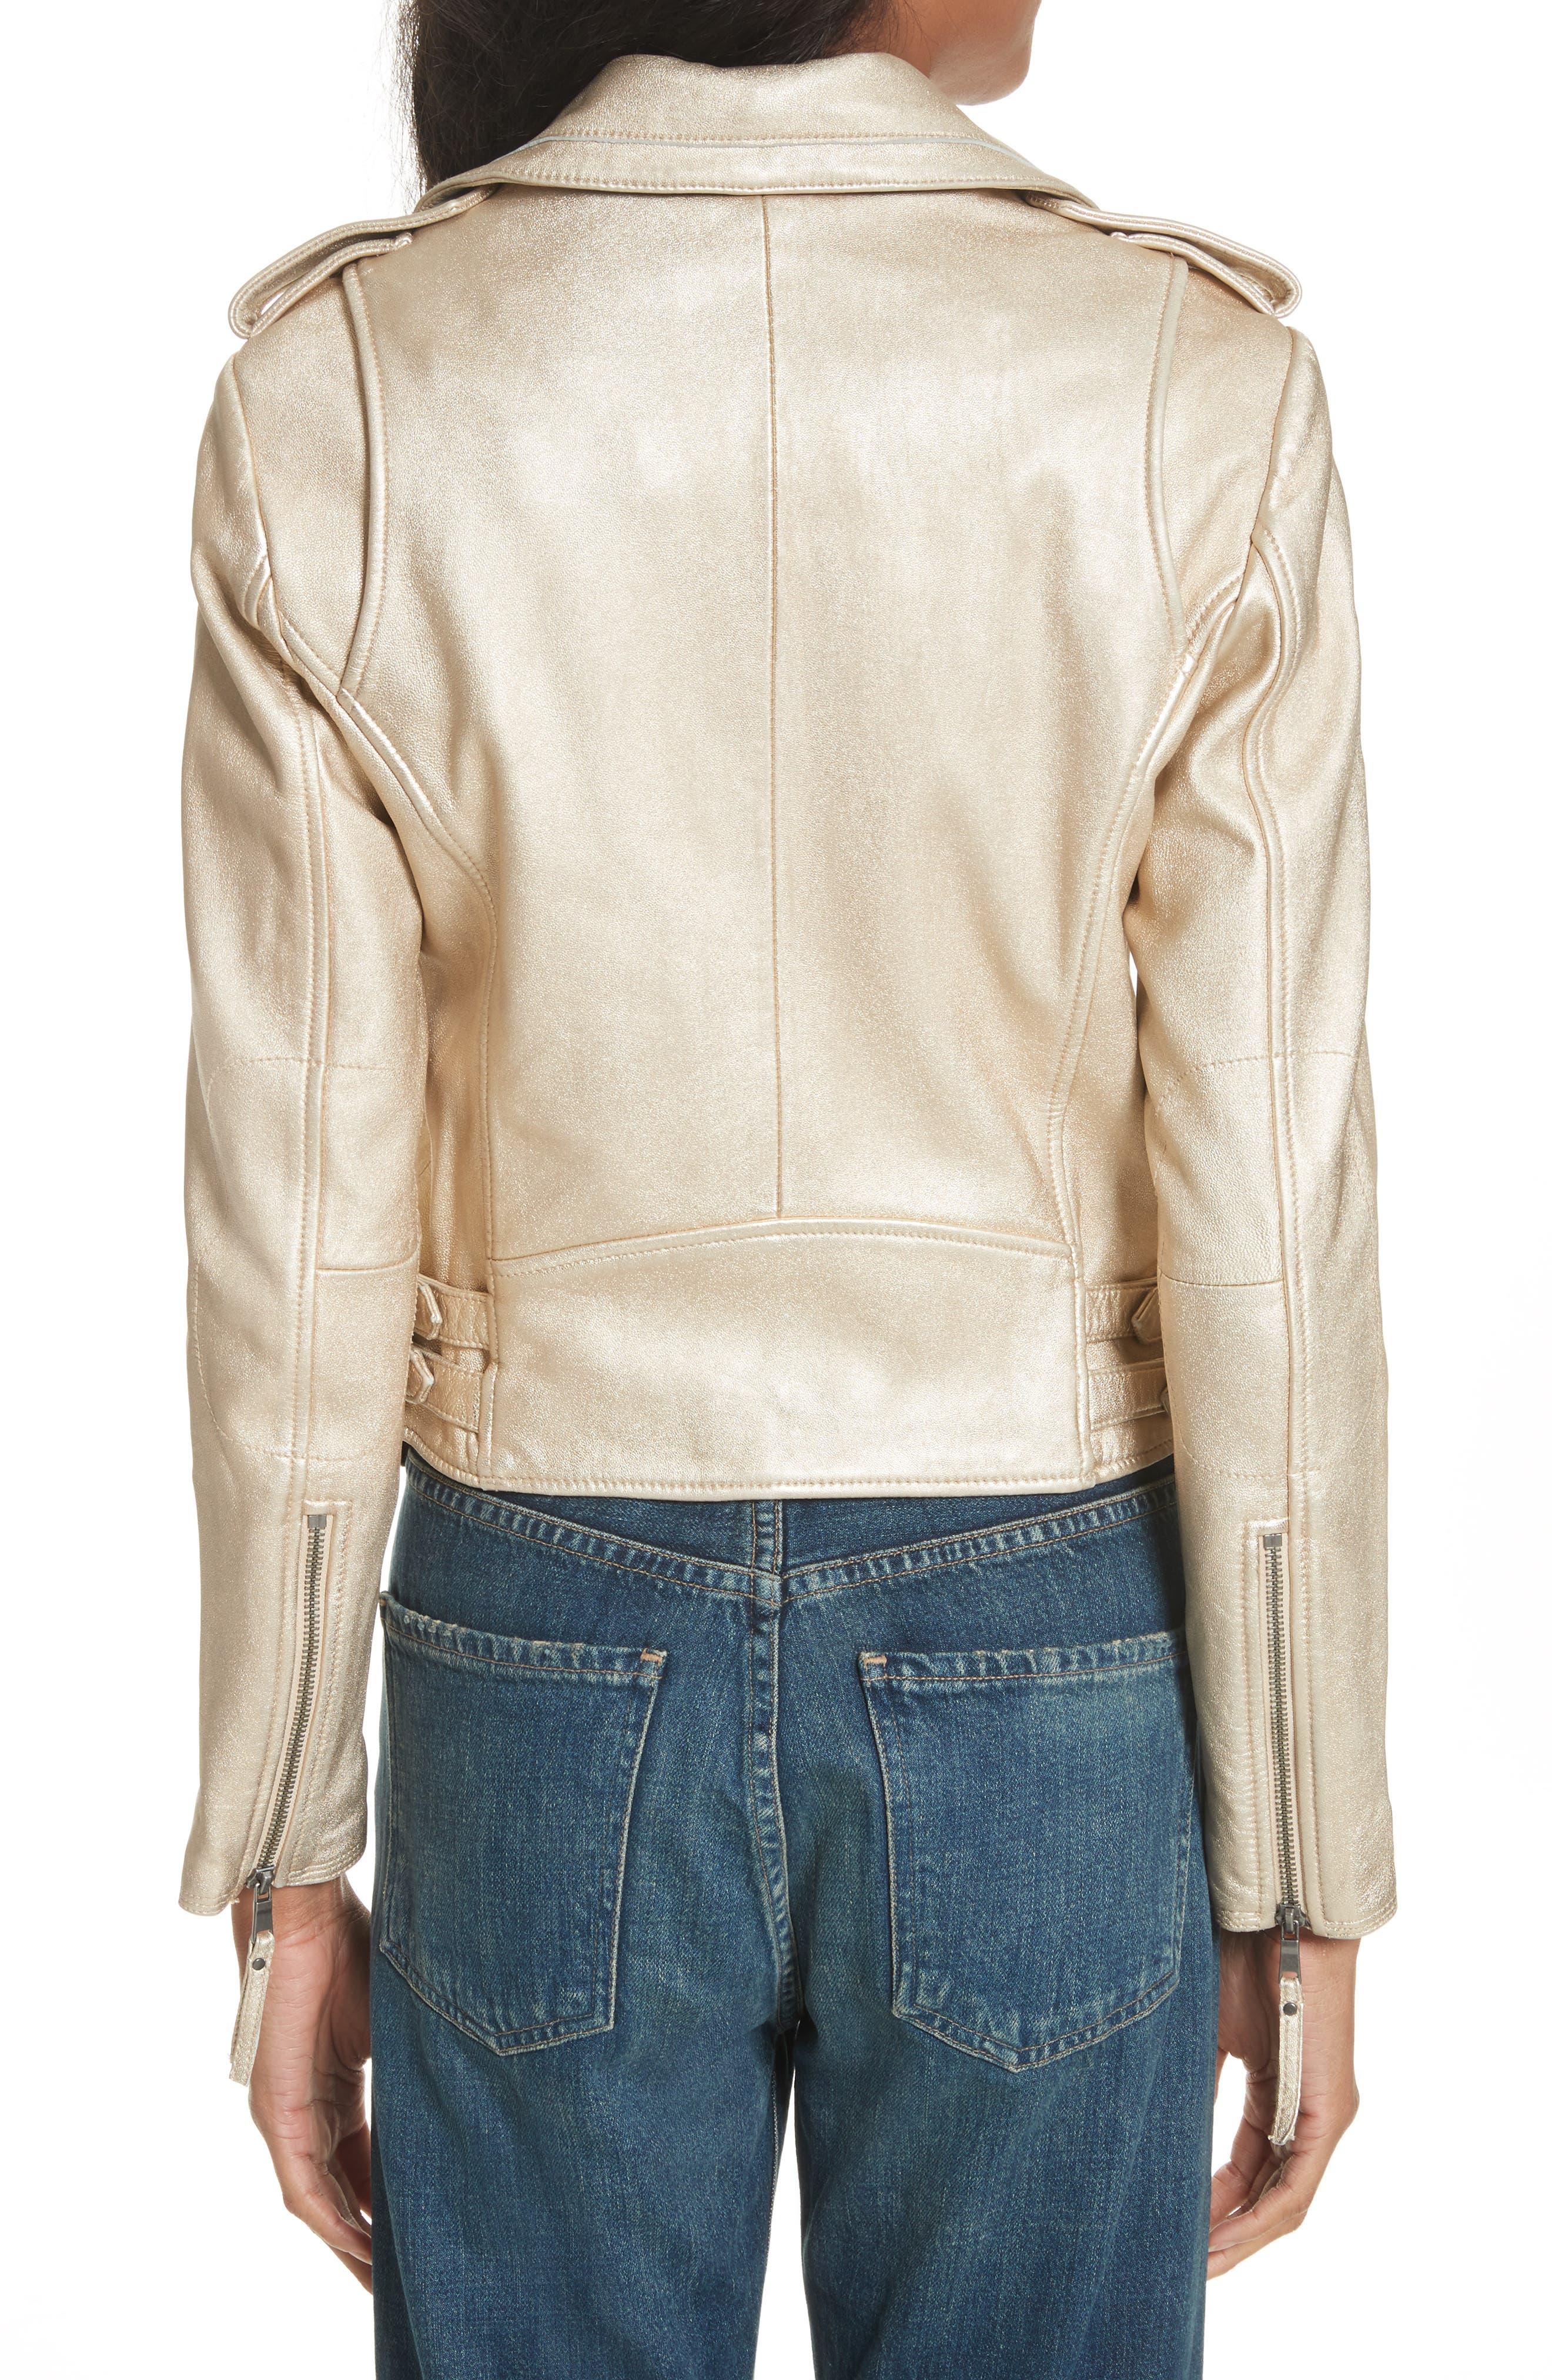 Leolani Leather Jacket,                             Alternate thumbnail 4, color,